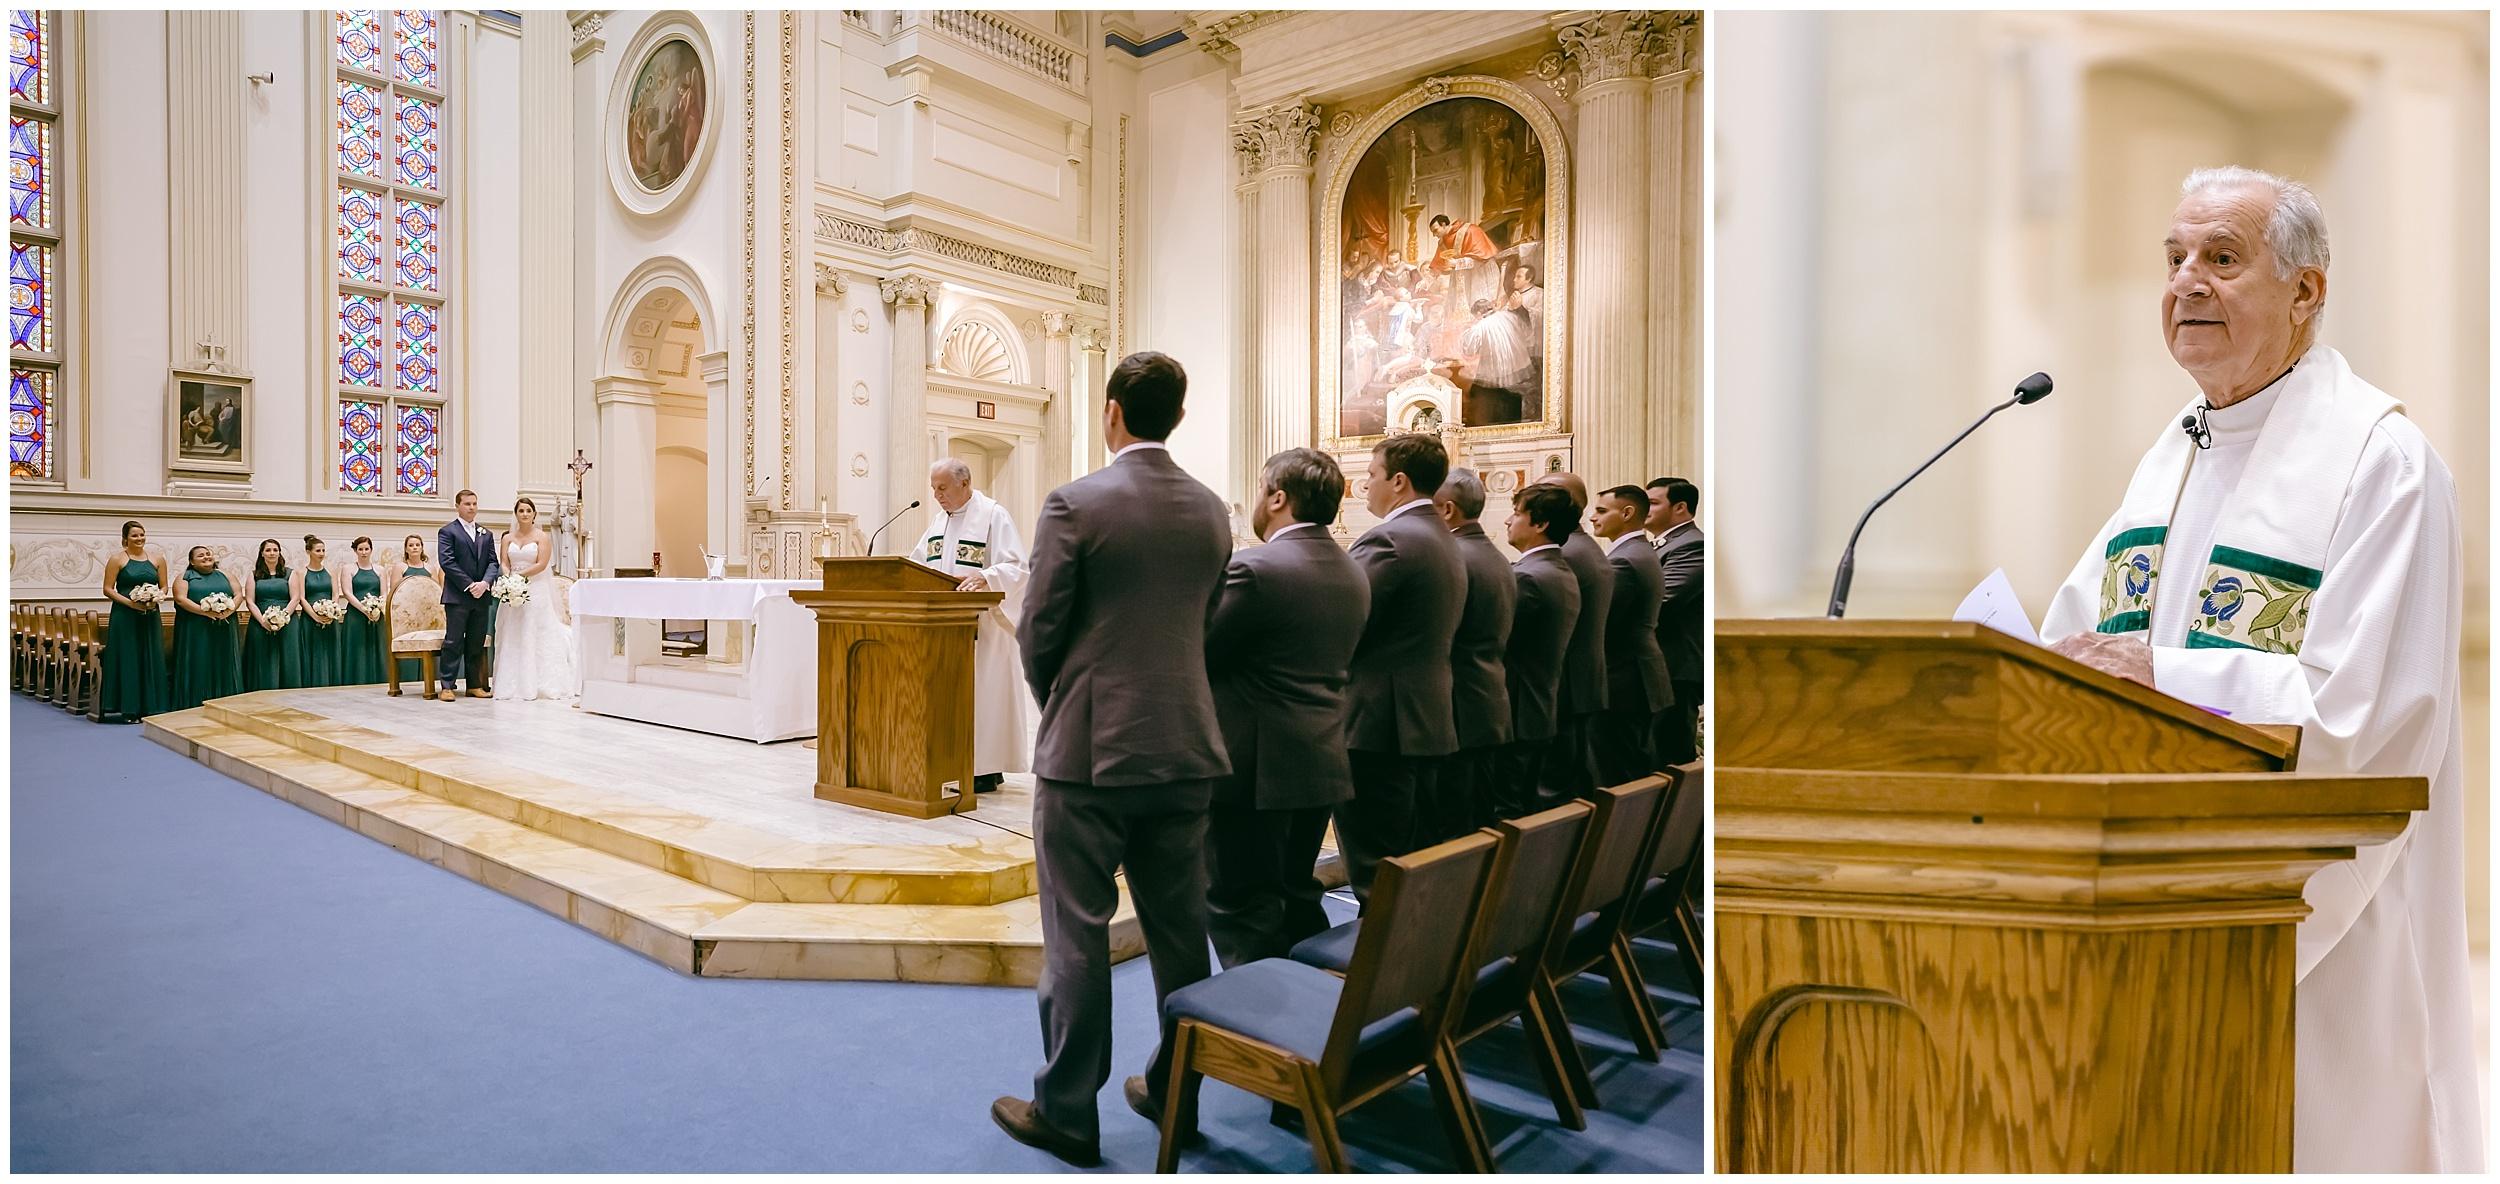 wedding-ceremony-bride-groom-wedding-party-standing-catholic-washington-dc-photographer